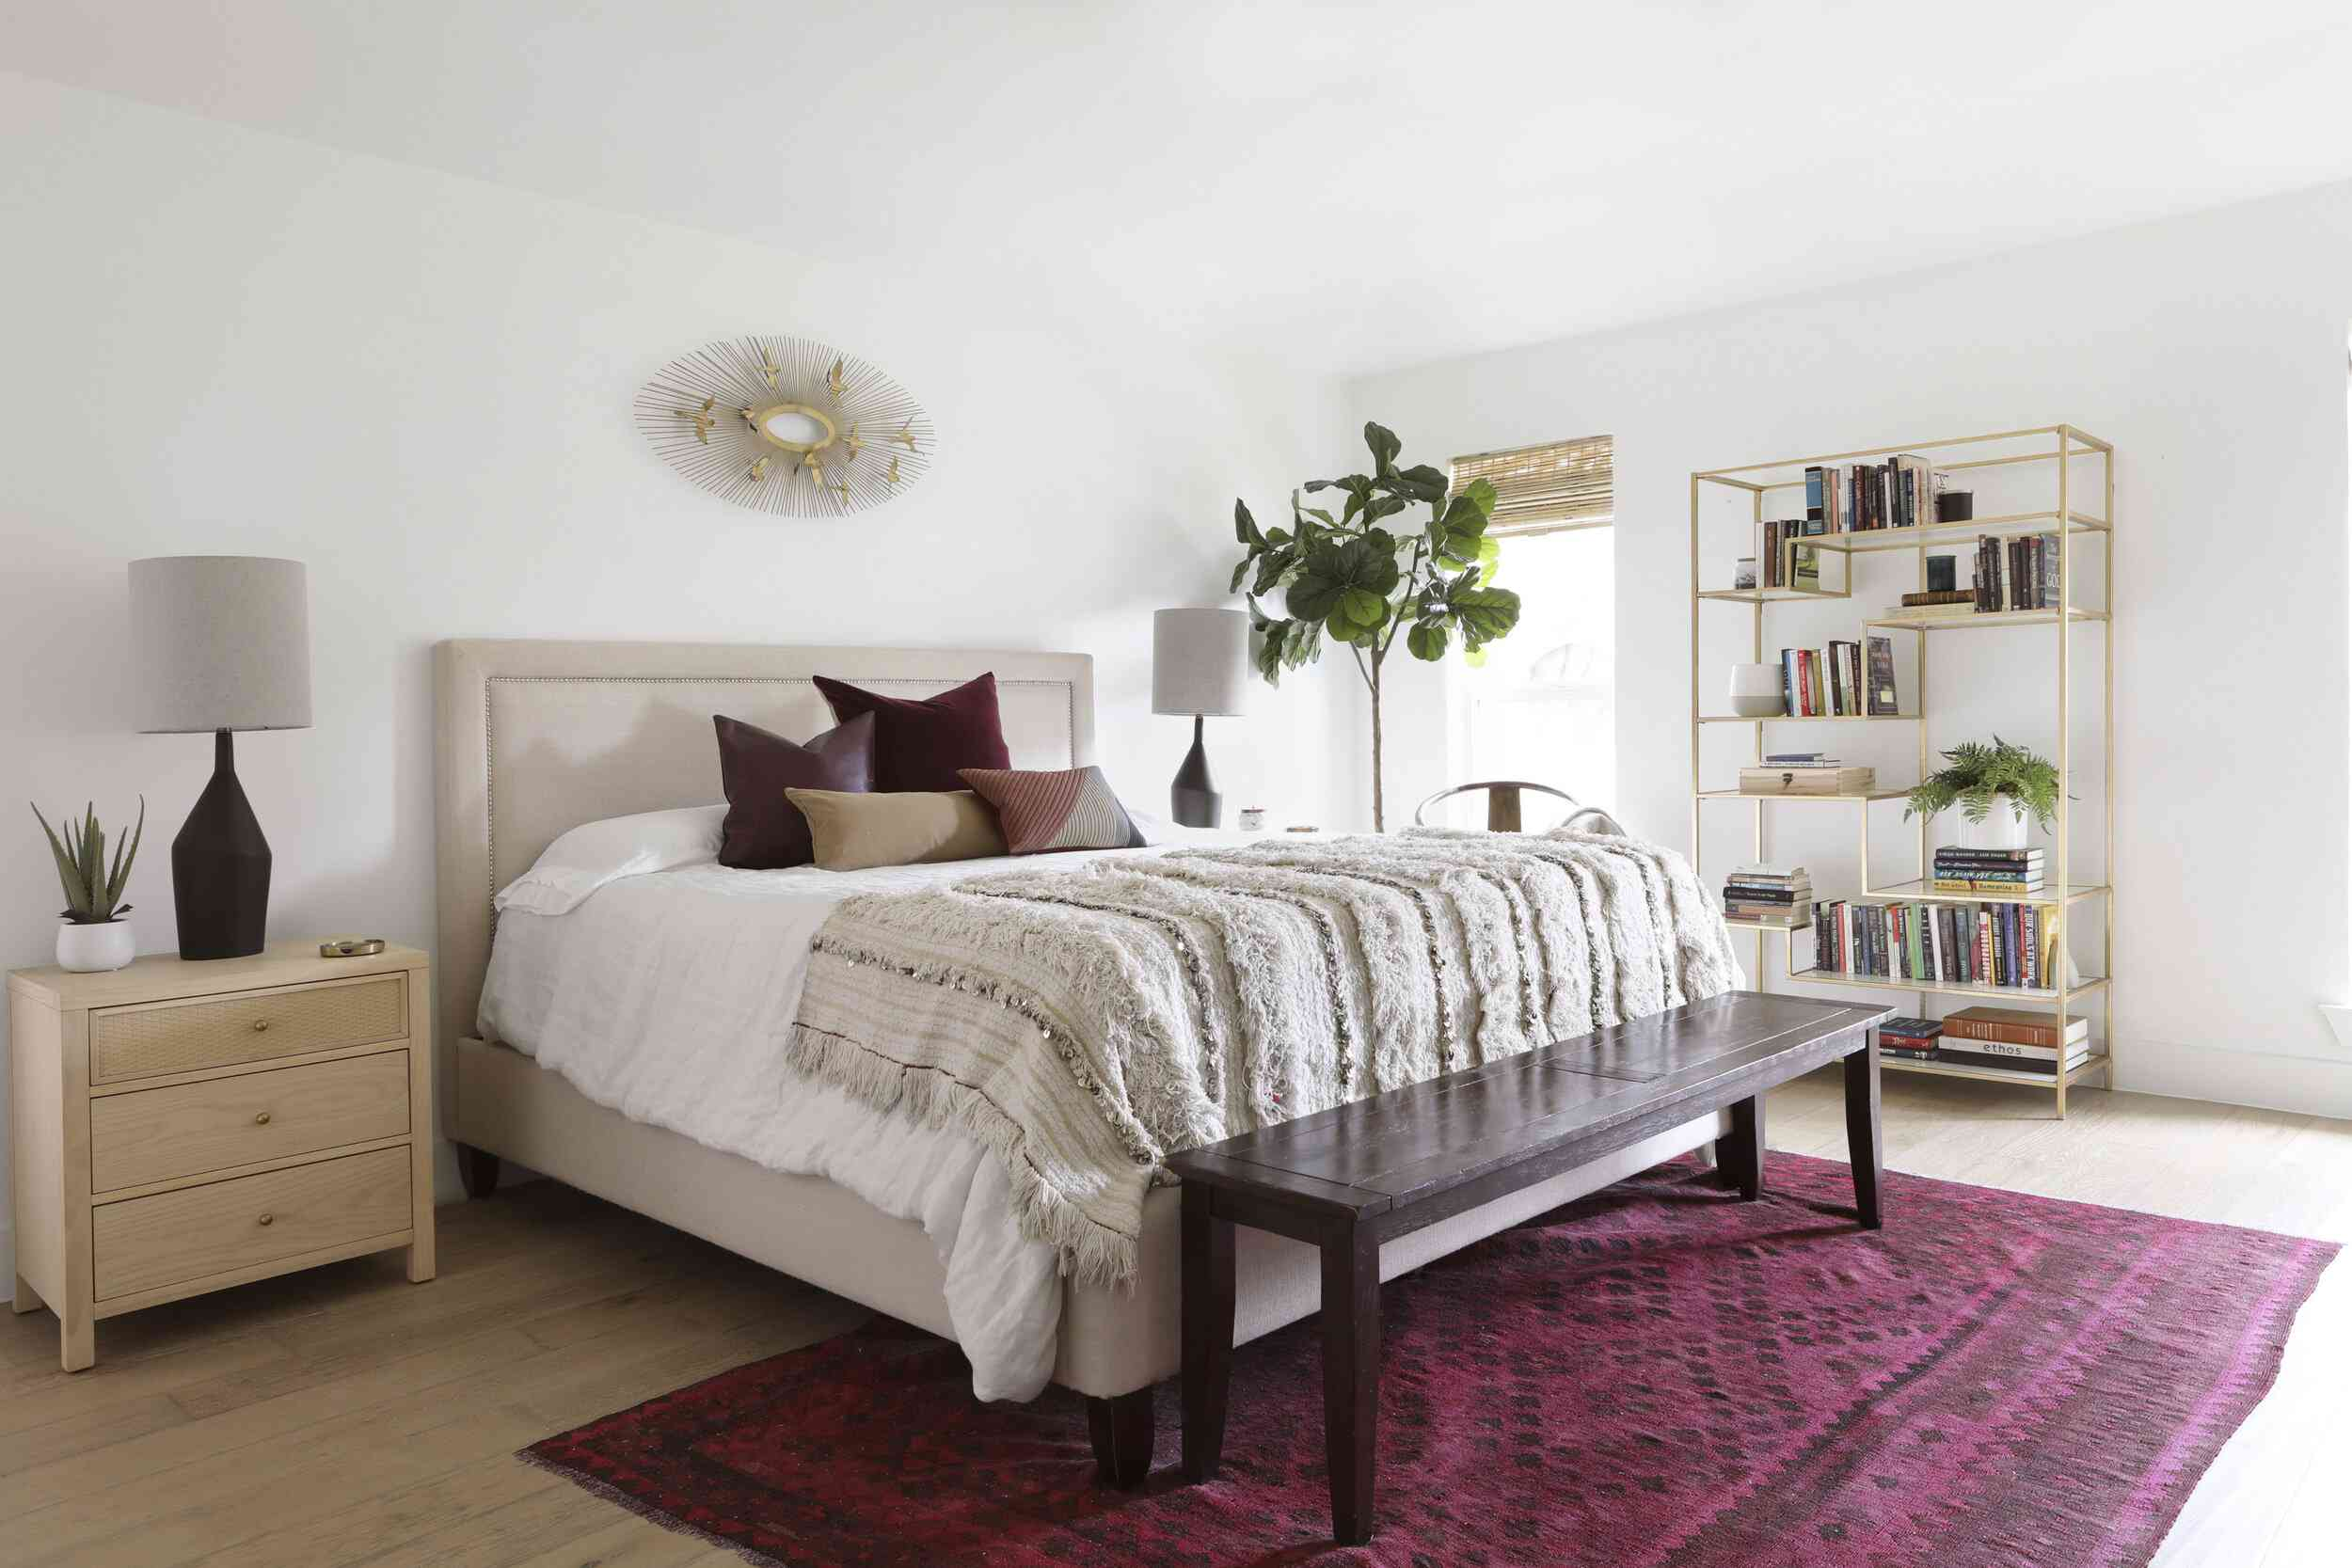 Bedroom with a bookshelf